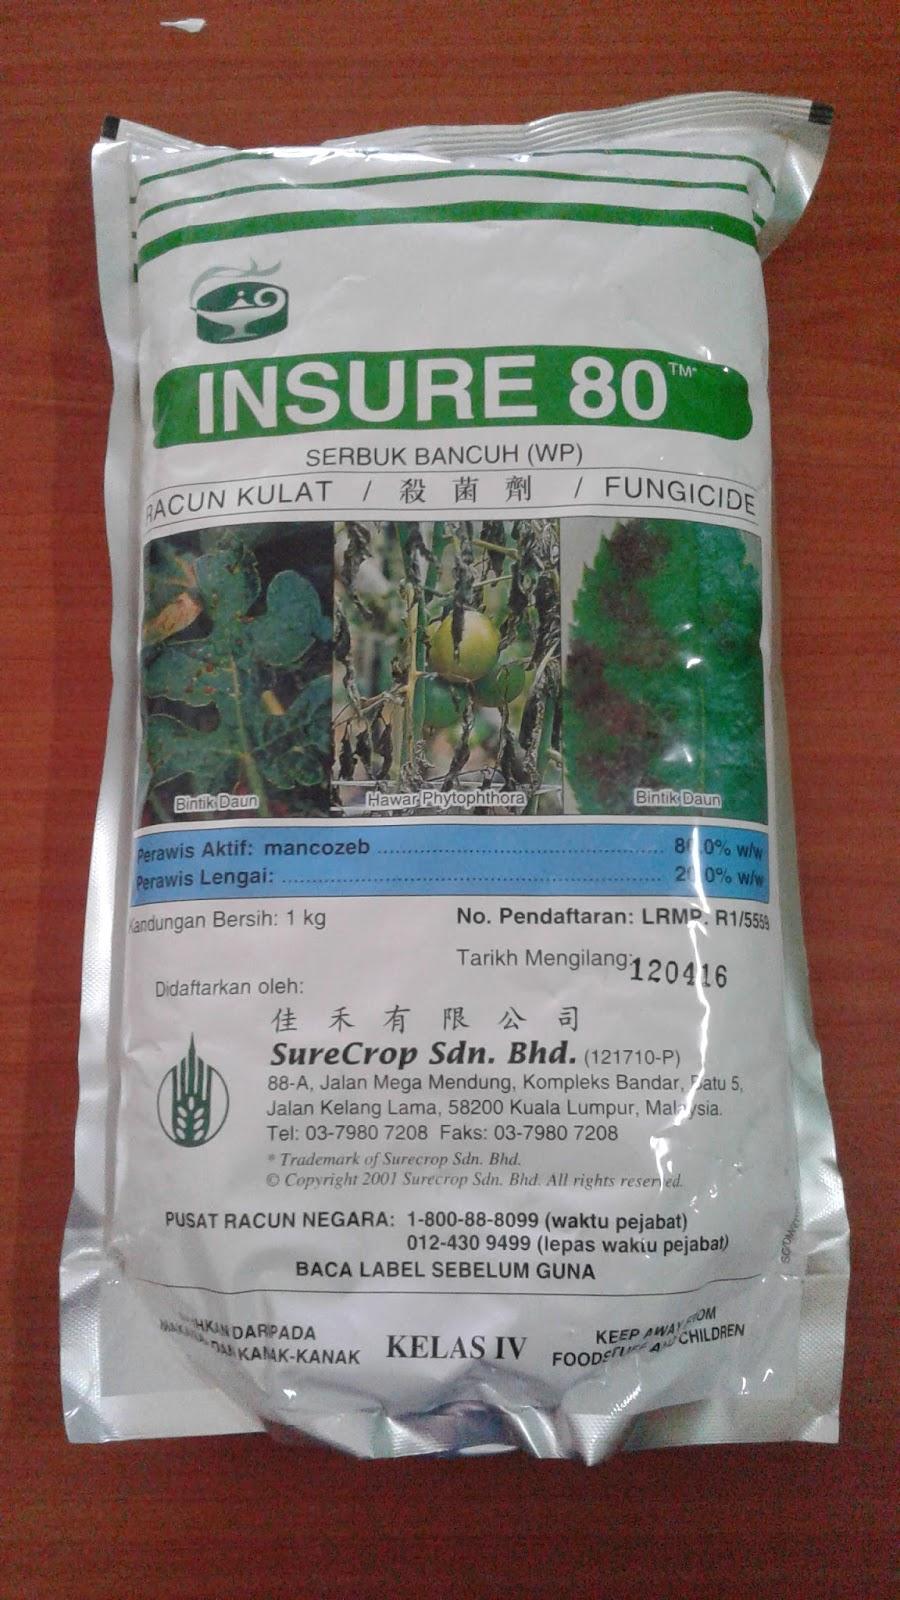 Insure 80 - RM26.50